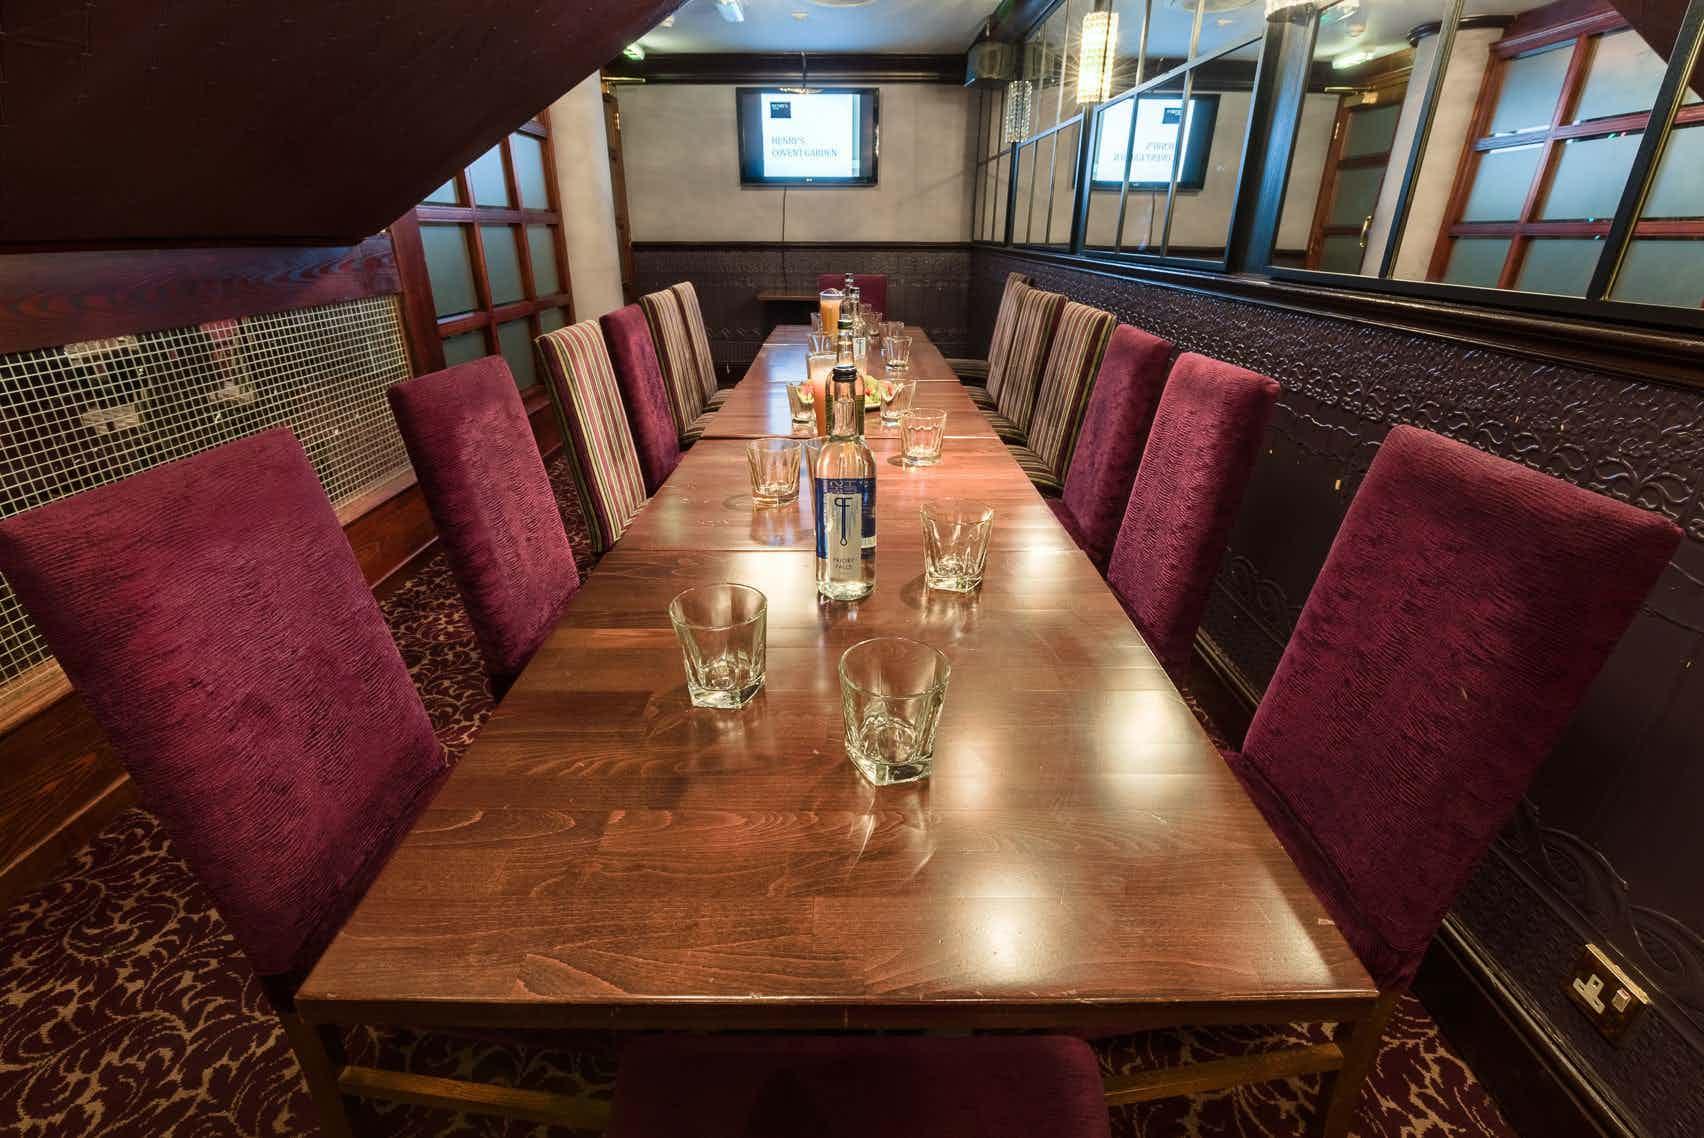 Dinner, Private Dining Room, Henry's Cafe Bar